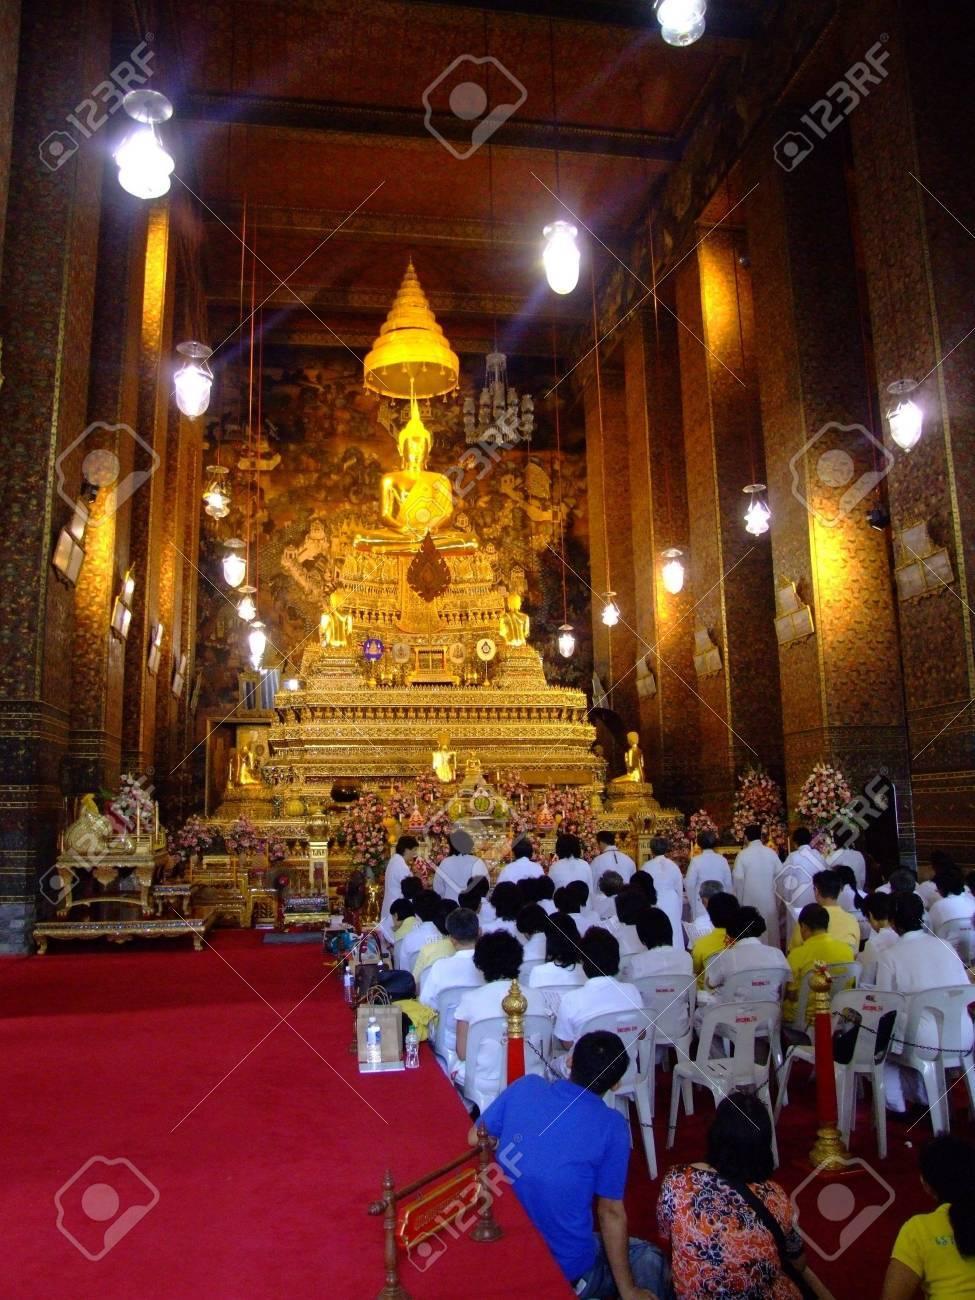 BANGKOK, THAILAND - JANUARY 7: Thai people in Wat Arun worshiping Buddha on January 7, 2007 in Bangkok.  Stock Photo - 7492571